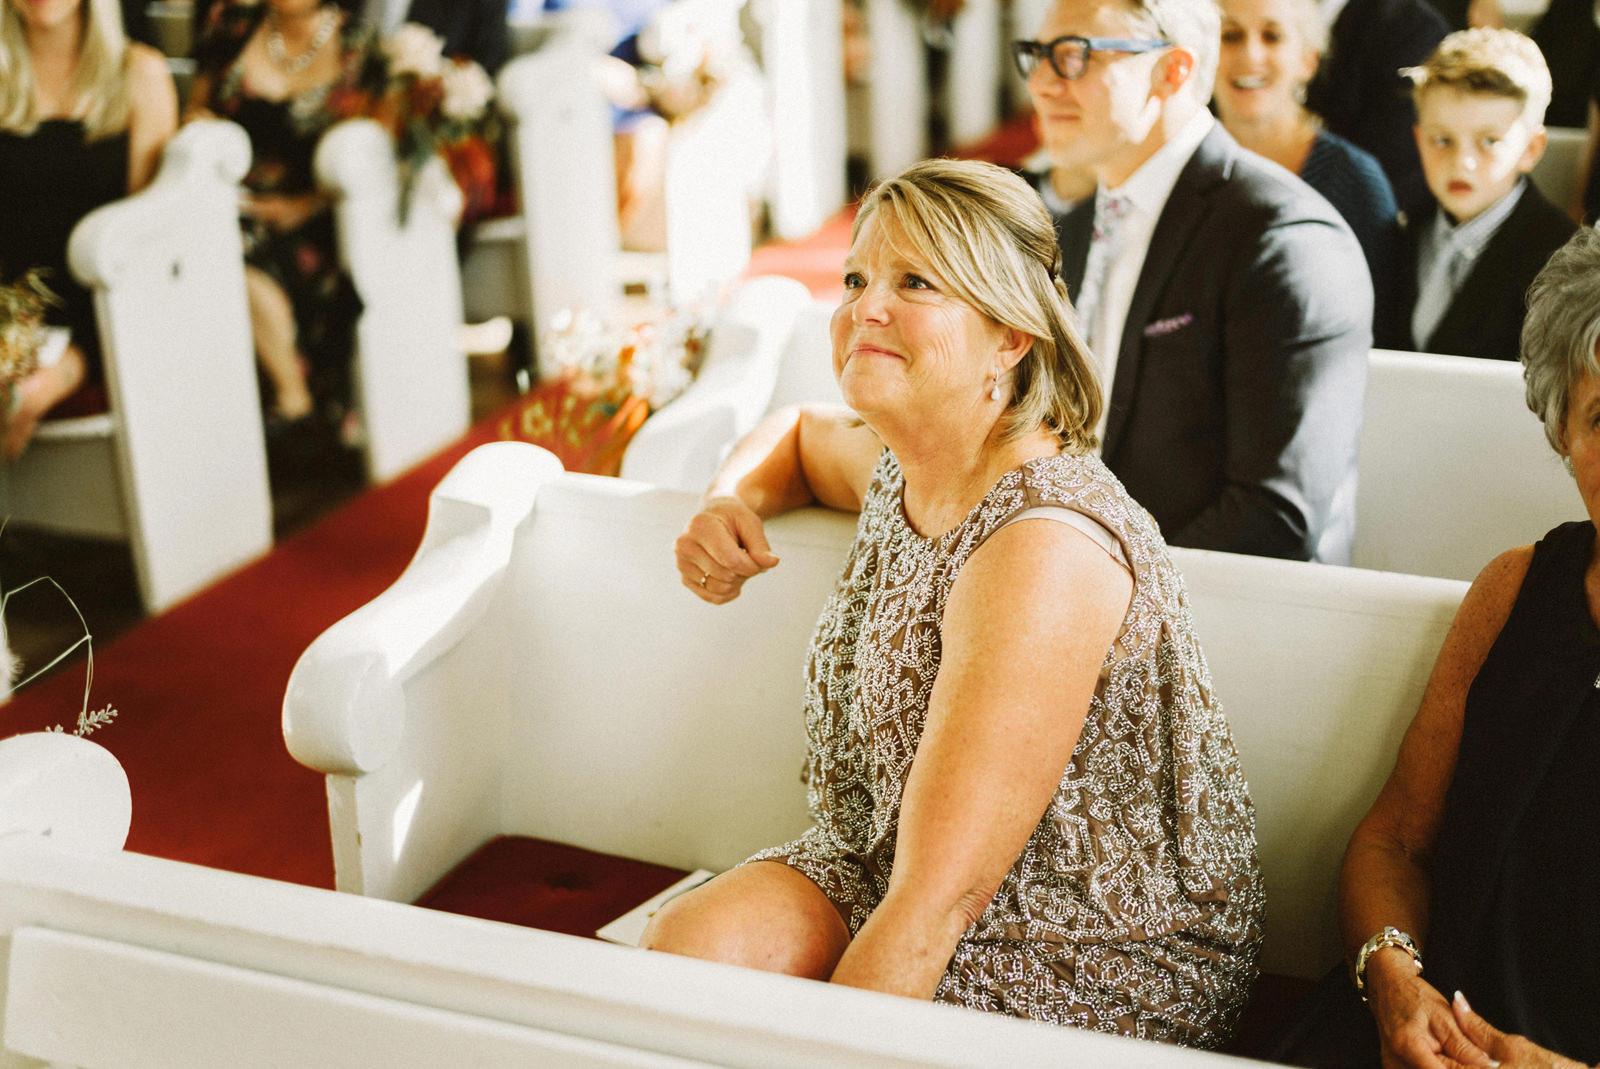 bridgeport-wedding-042 BRIDGEPORT, CONNECTICUT BACKYARD WEDDING